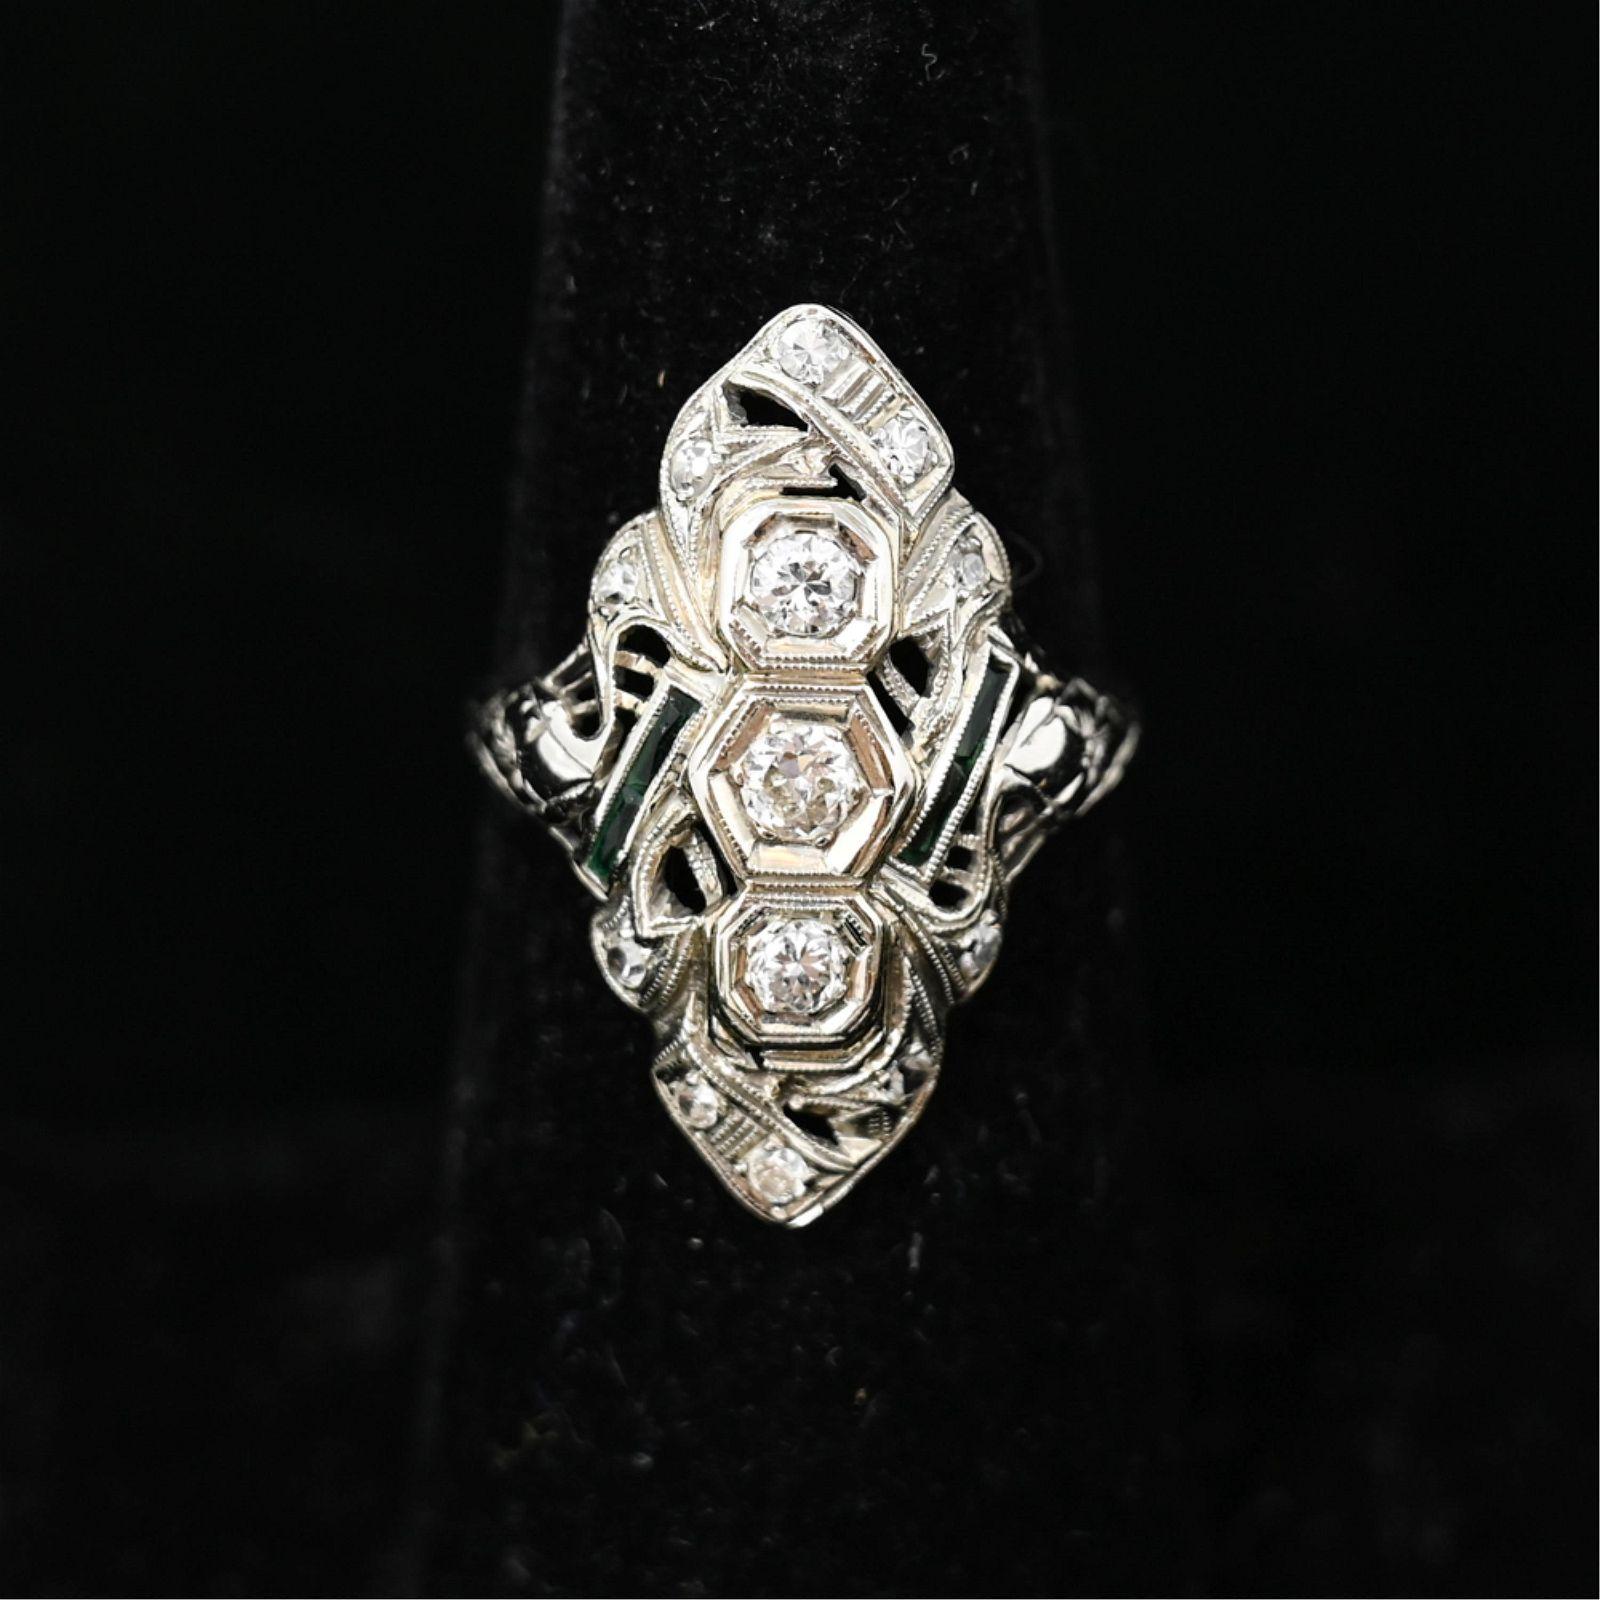 ART DECO DIAMOND COCKTAIL RING